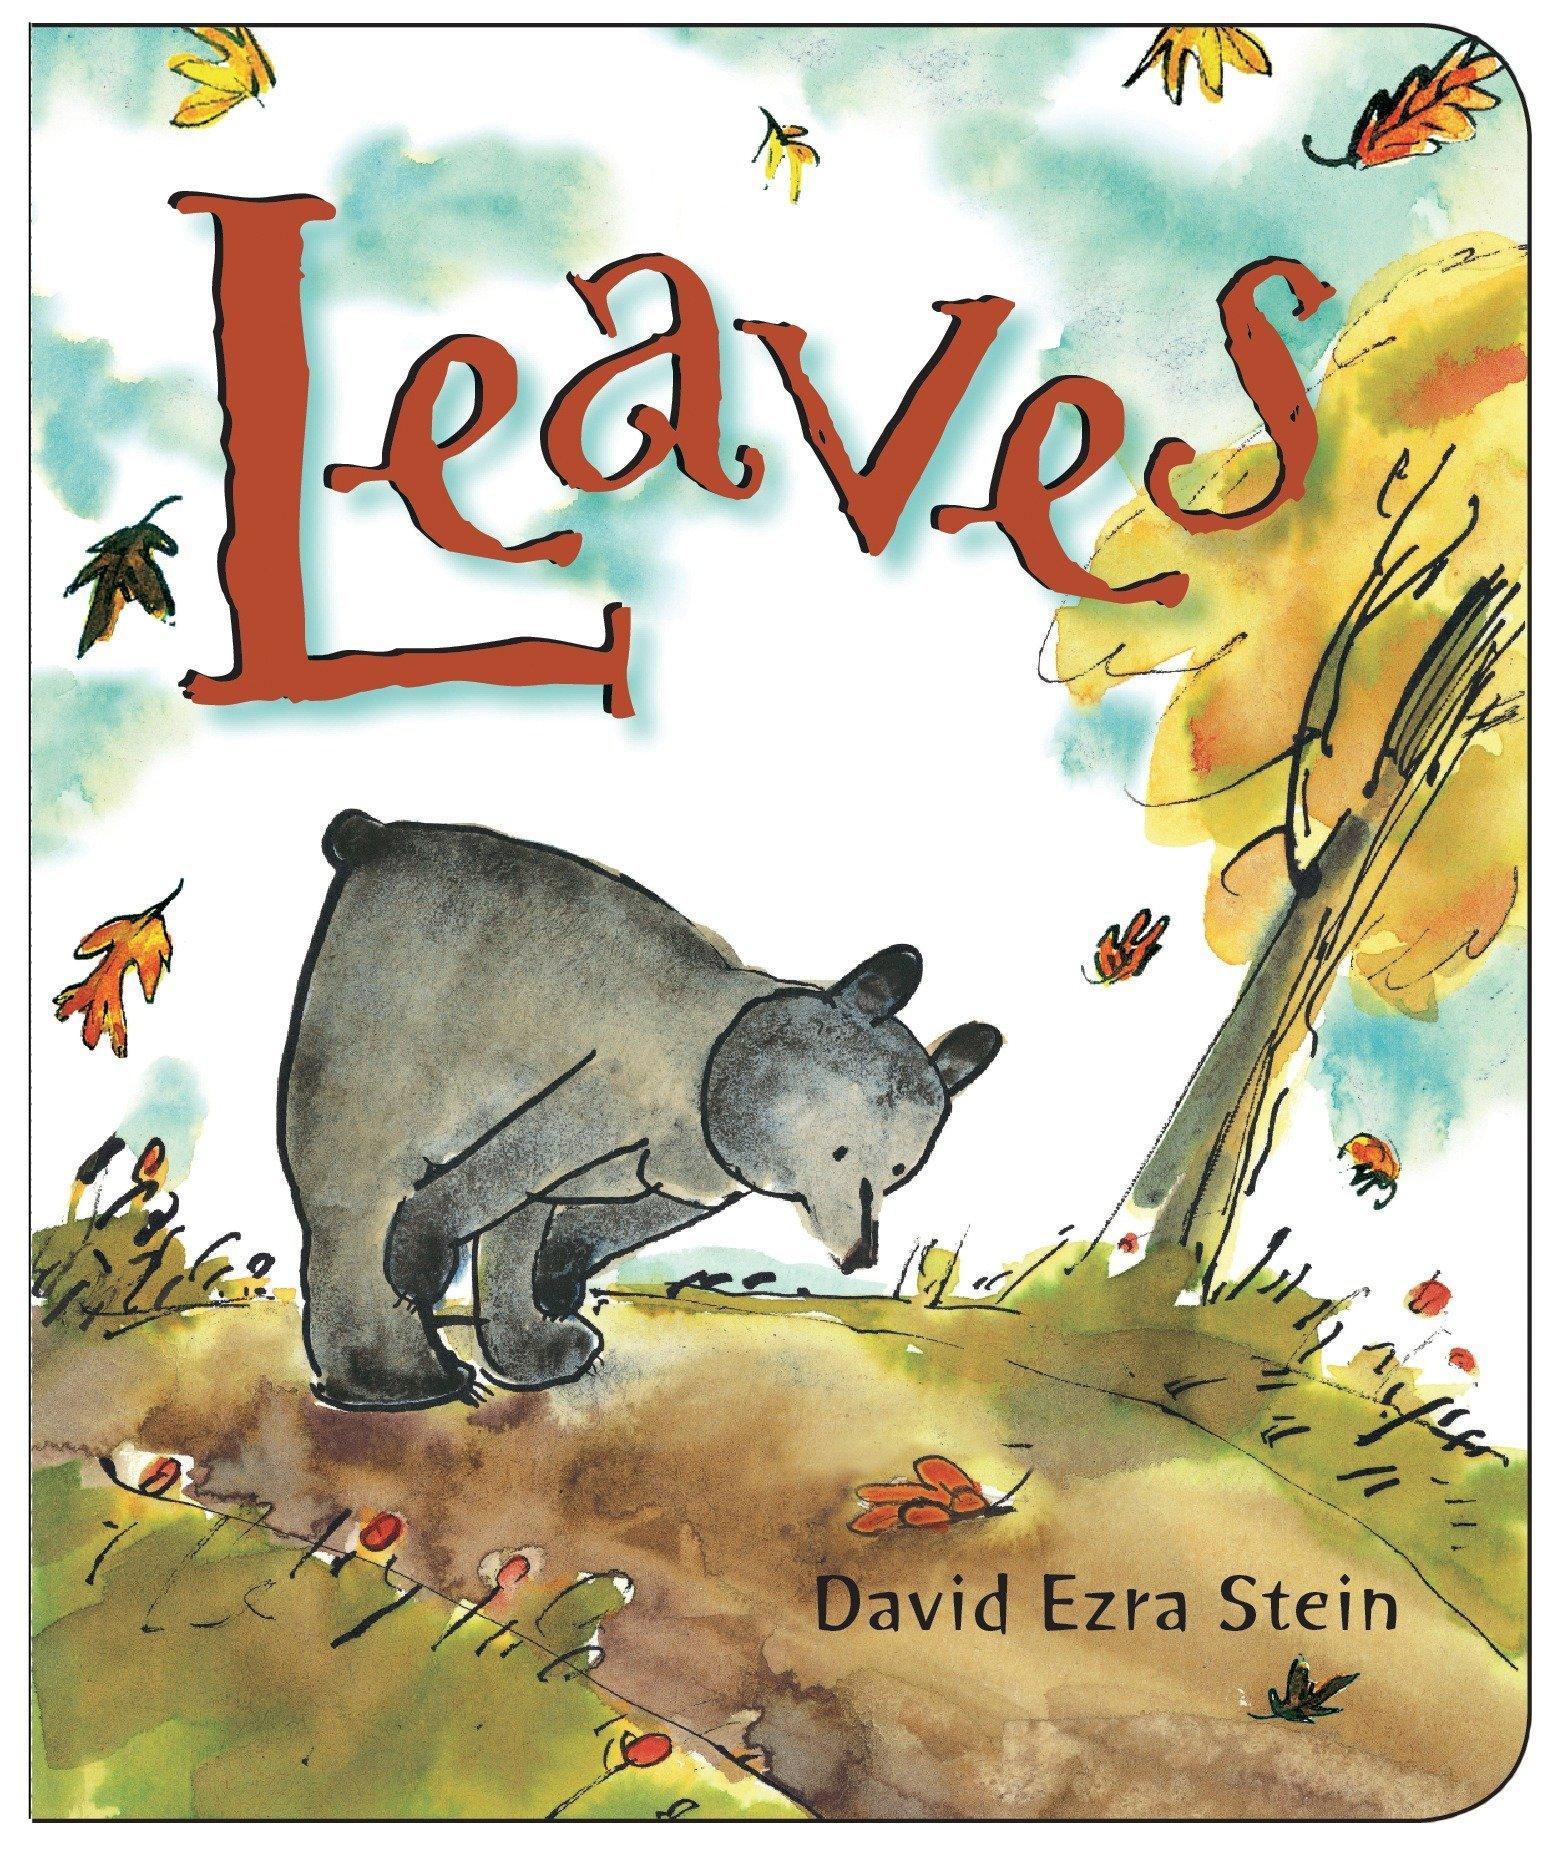 Leaves David Ezra Stein product image